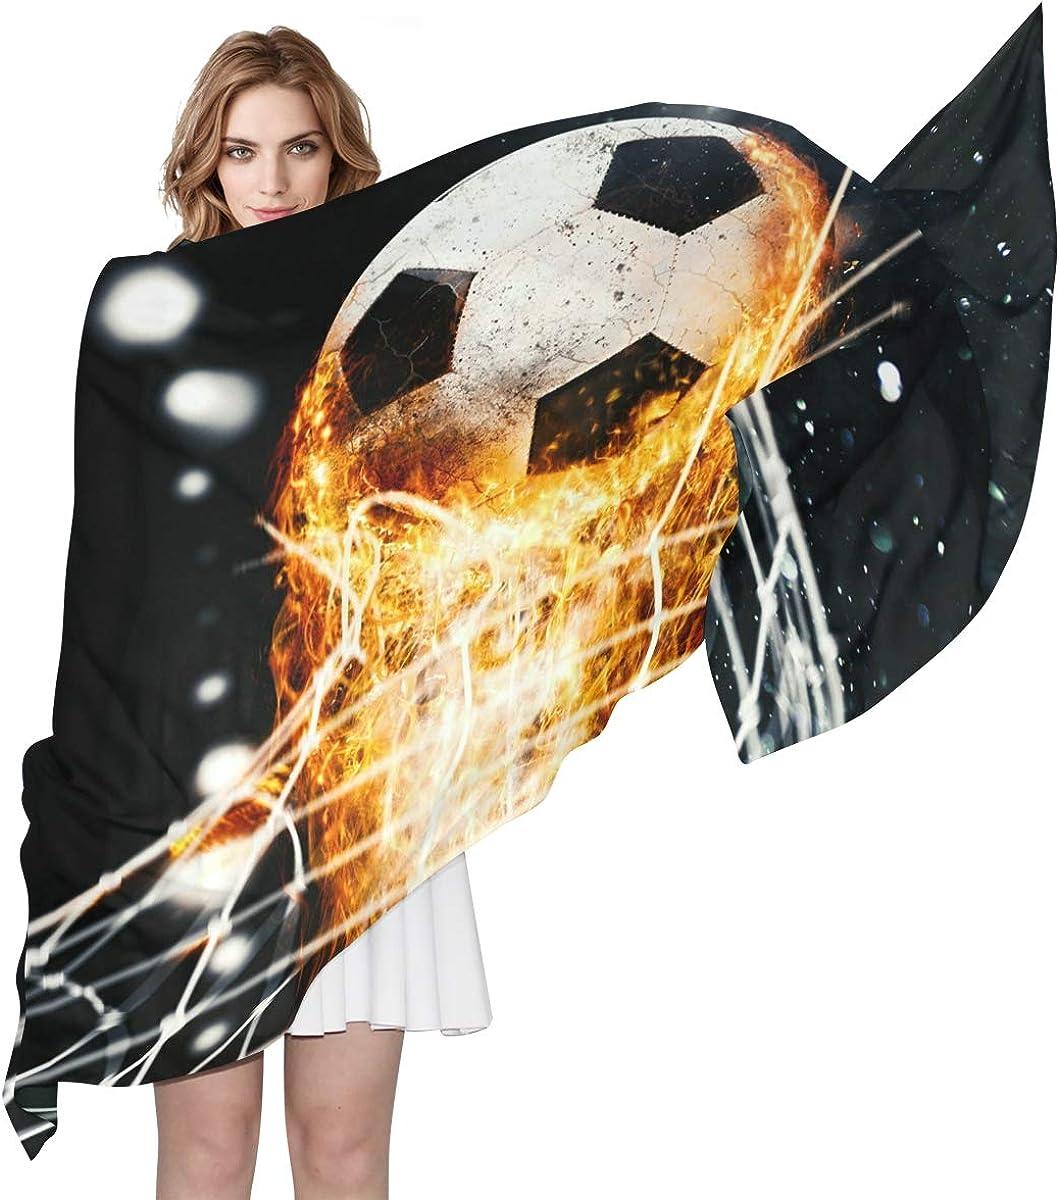 XLING Fashion Scarf Burning Football Soccer Long Lightweight Sunscreen Scarf Shawl Wrap Muffler Neckerchief for Women Men